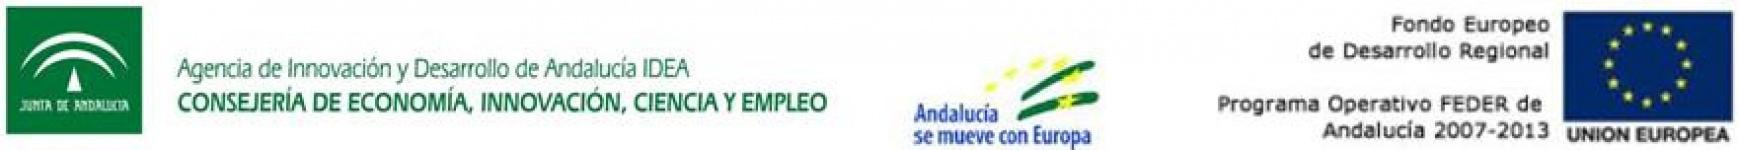 opiniones Mitsuco A C Spain